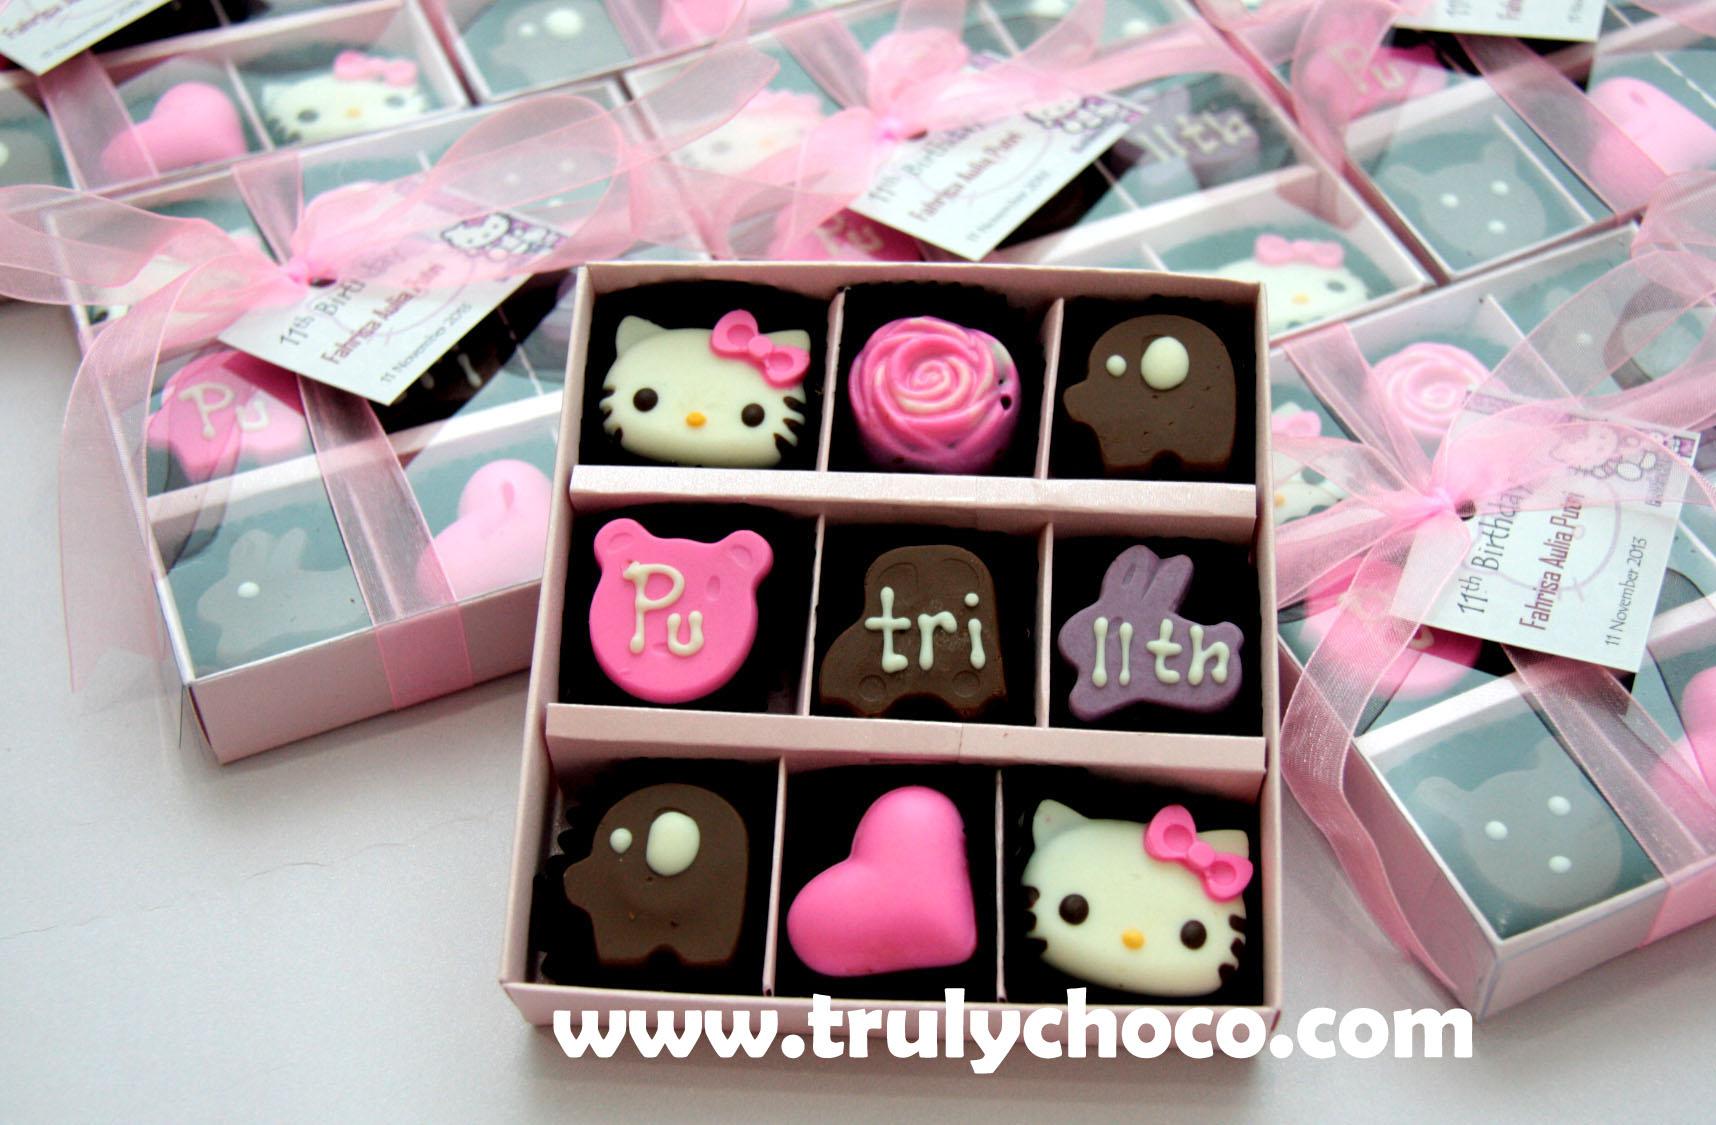 souvenir ultah coklat hello kitty